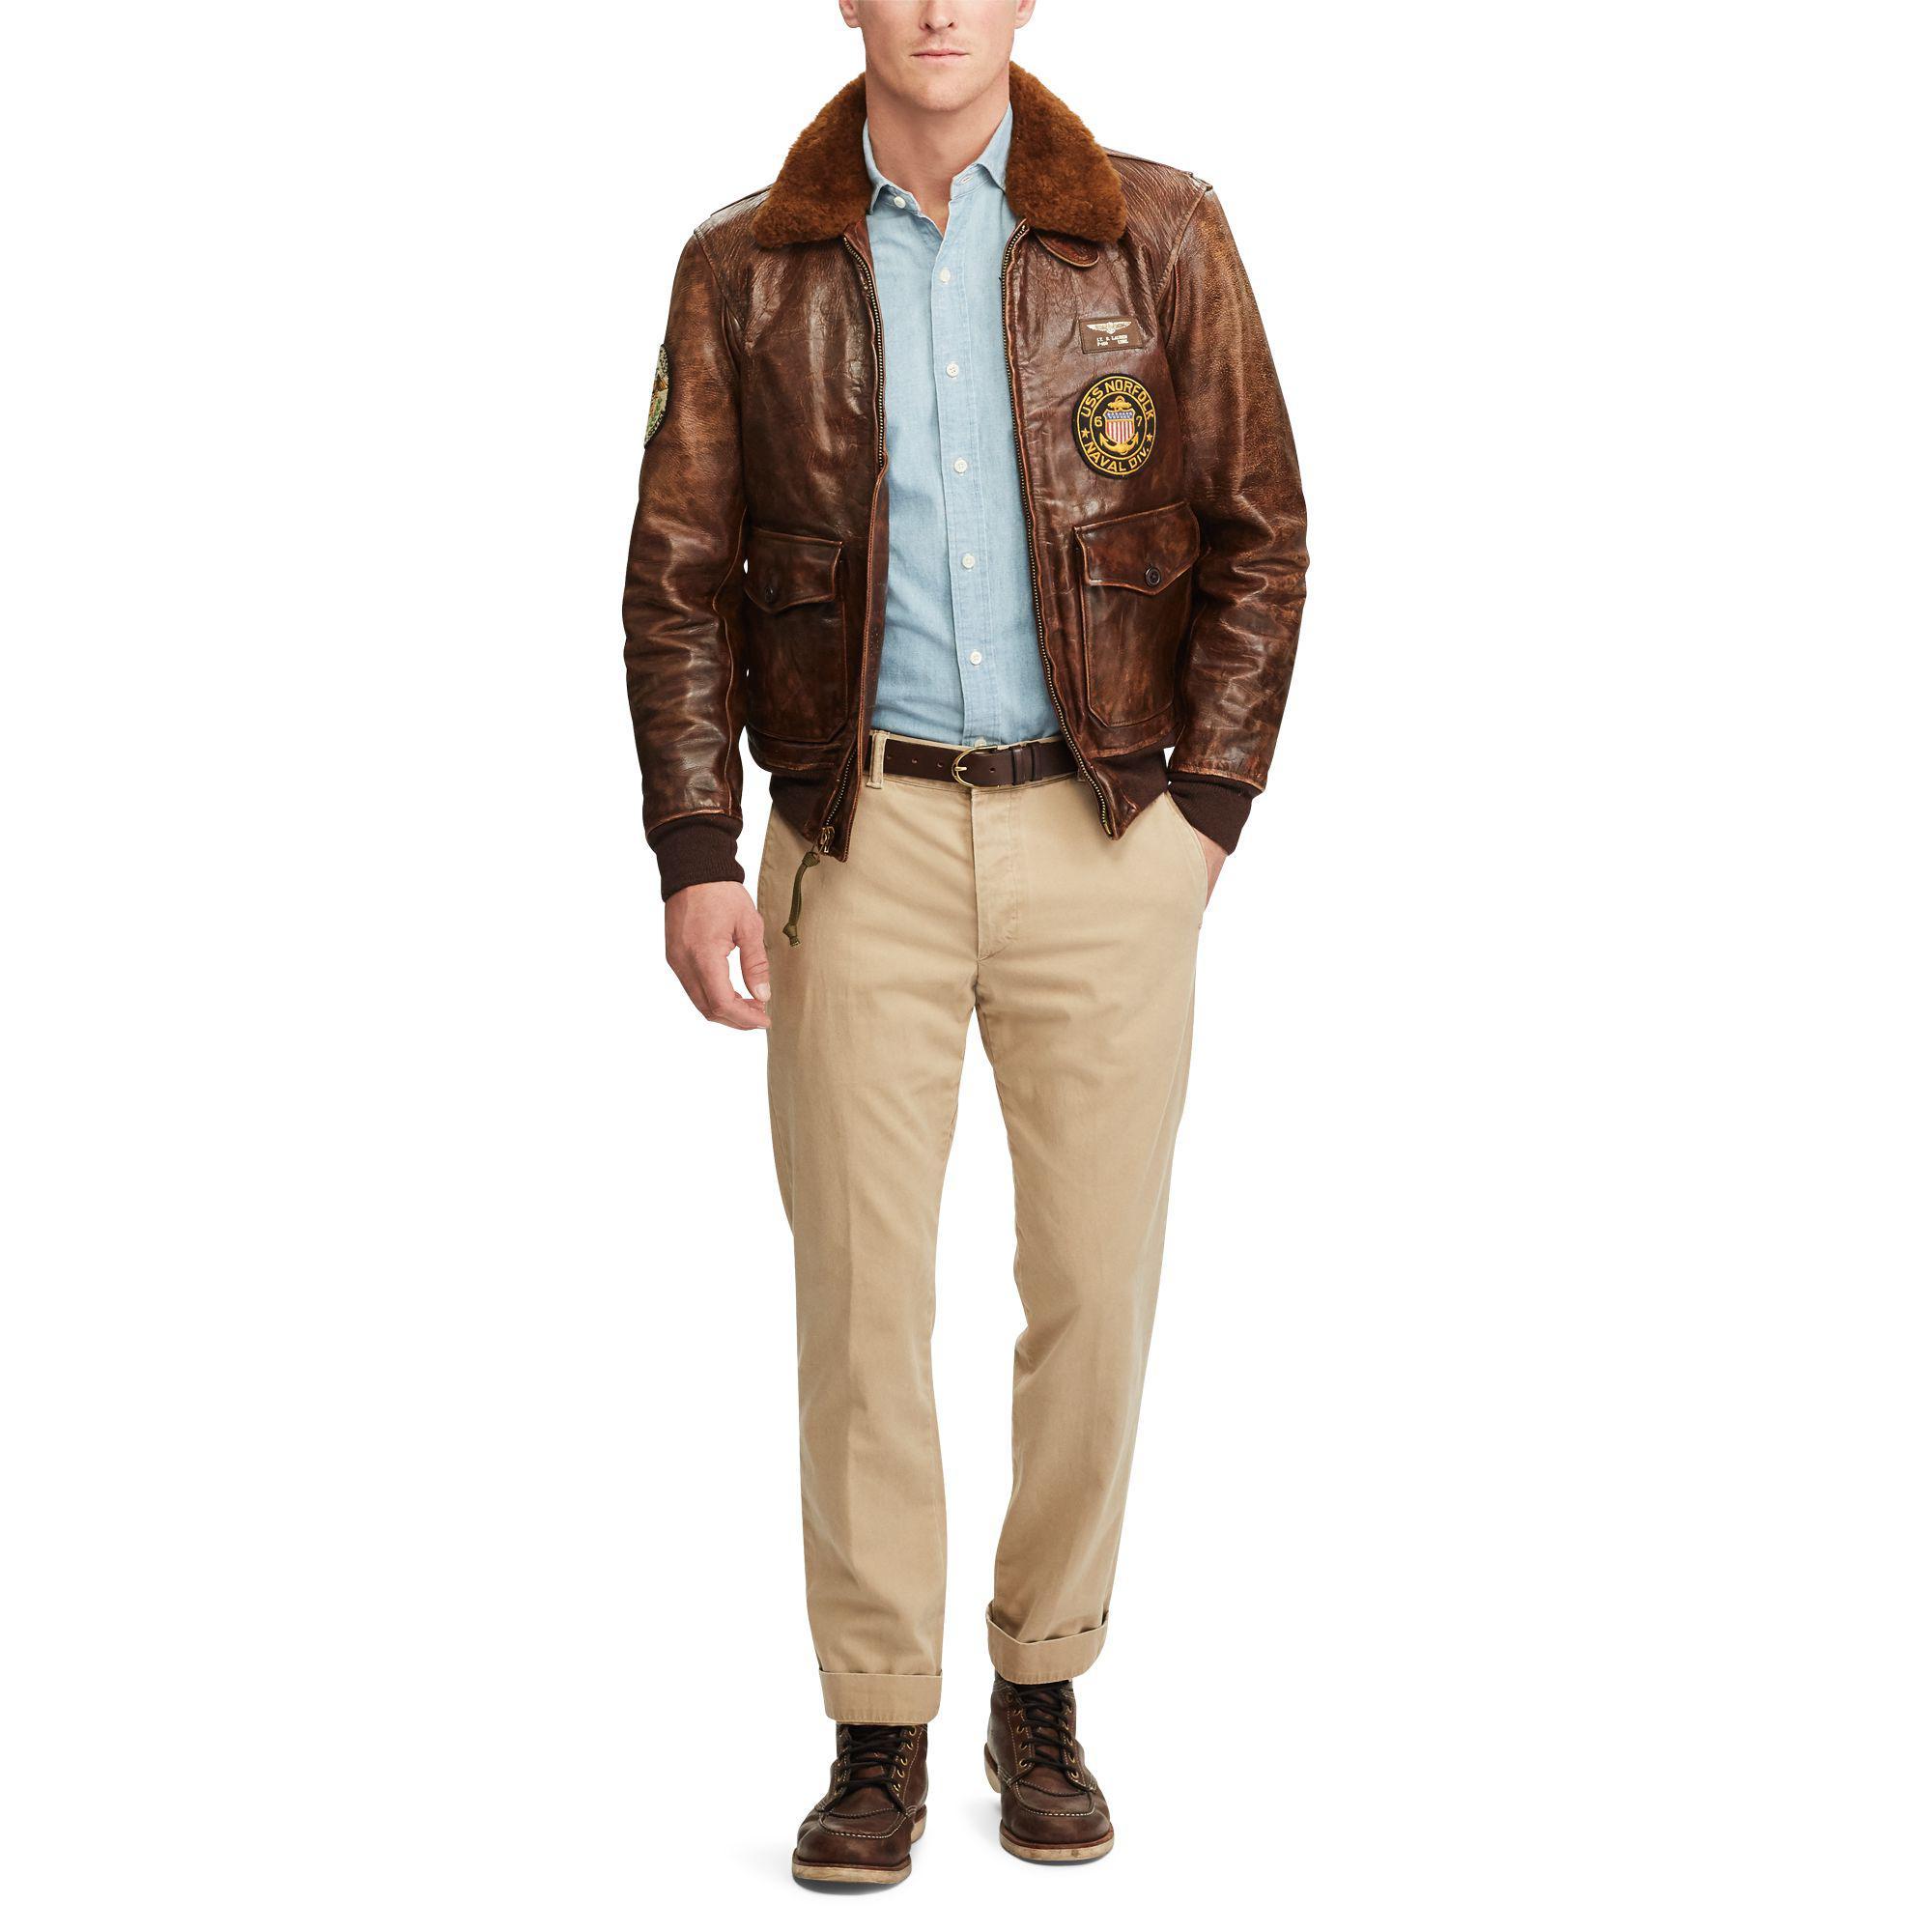 c5684e7b840 Polo Ralph Lauren - Brown The Iconic G-1 Bomber Jacket for Men - Lyst. View  fullscreen